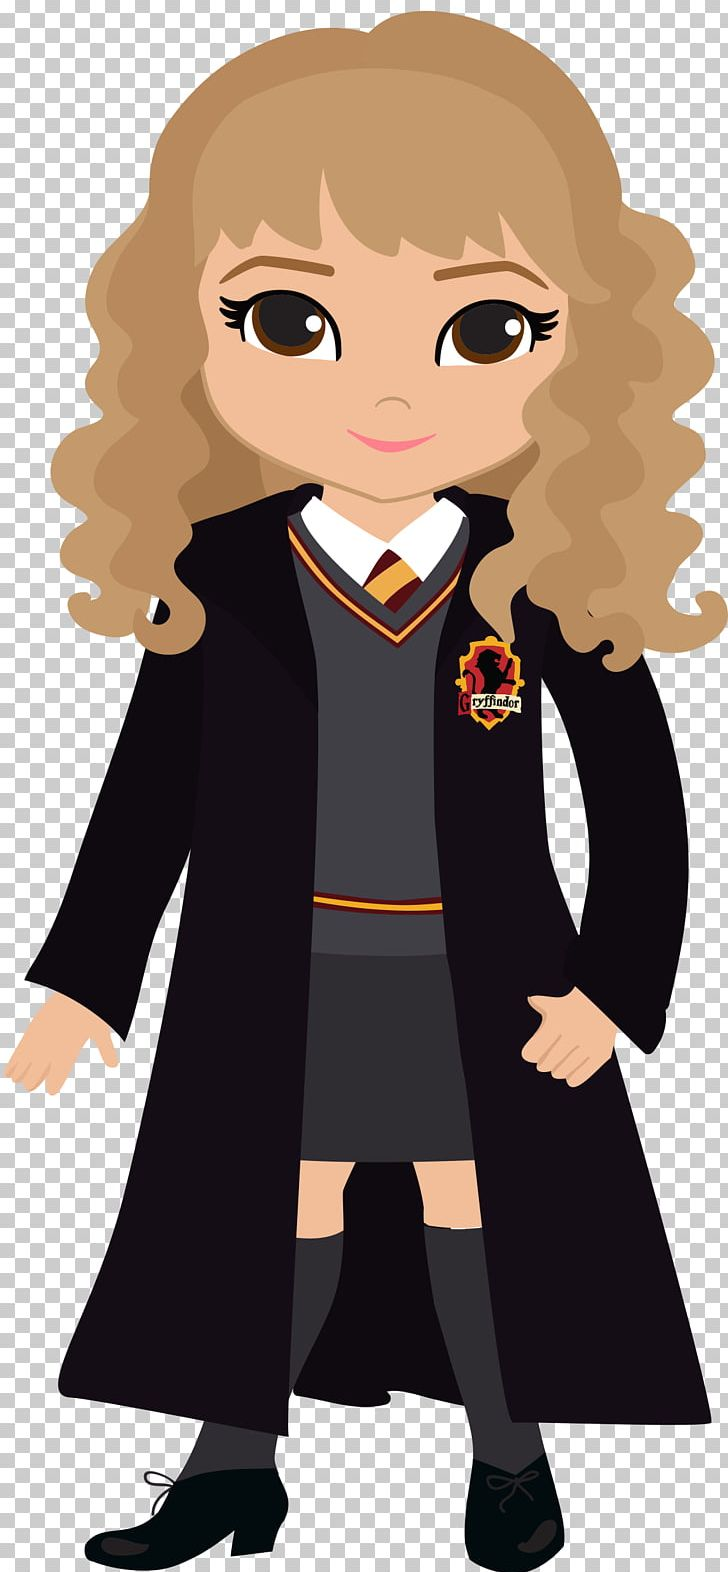 Hermione Granger Ron Weasley Garrï Potter Bellatrix Lestrange PNG.